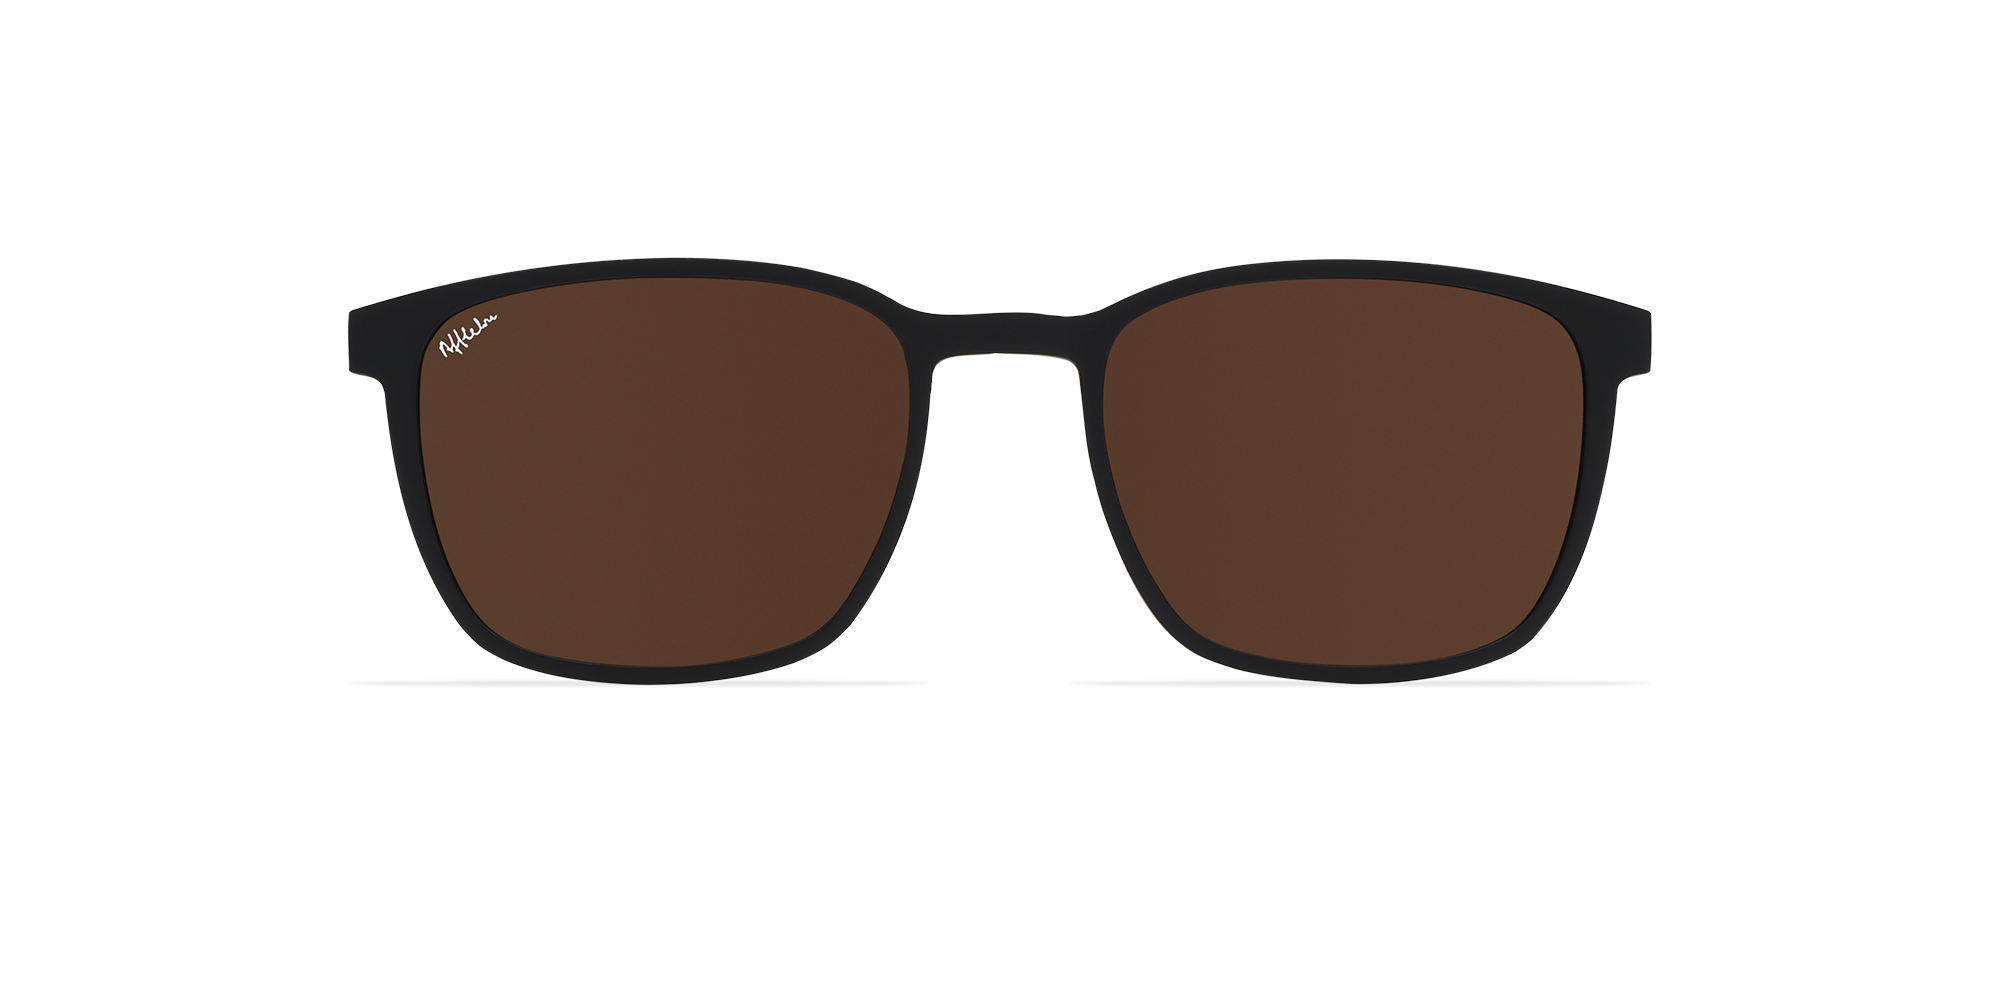 afflelou/france/products/smart_clip/clips_glasses/TMK42SUBK015319.png